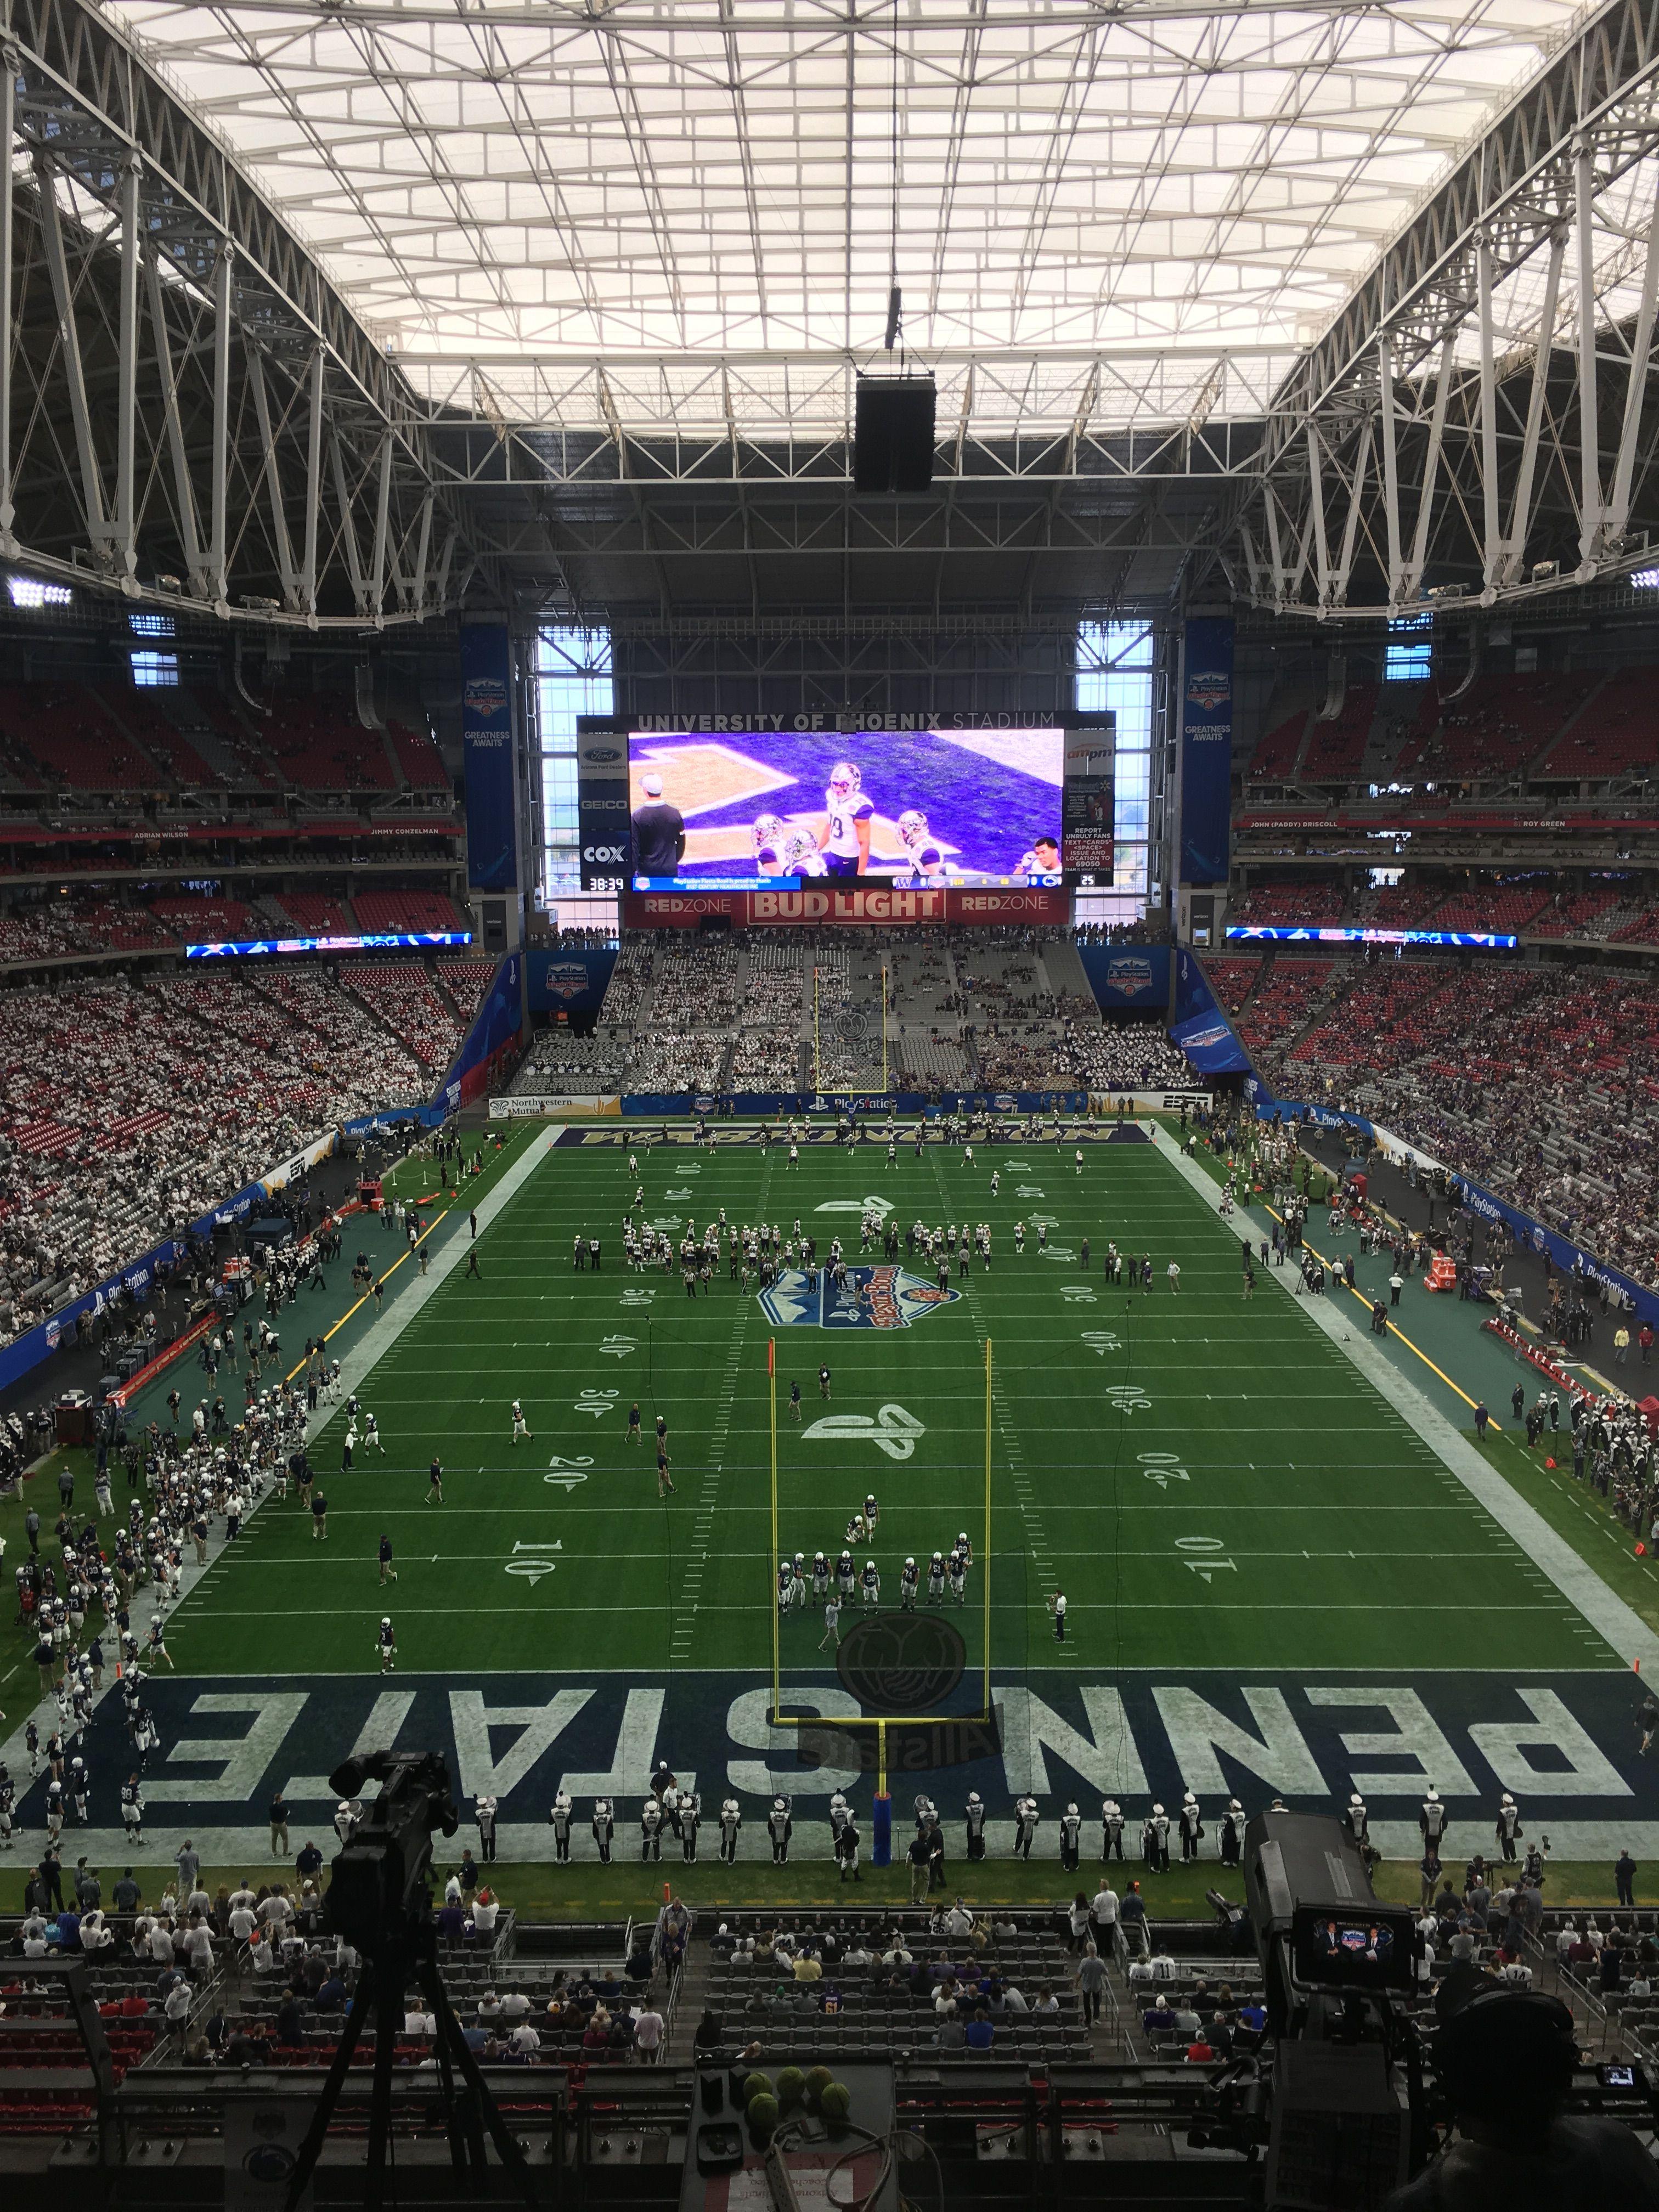 2017 Fiesta Bowl Penn State Vs Washington In Glendale Az Glendale Soccer Field Penn State